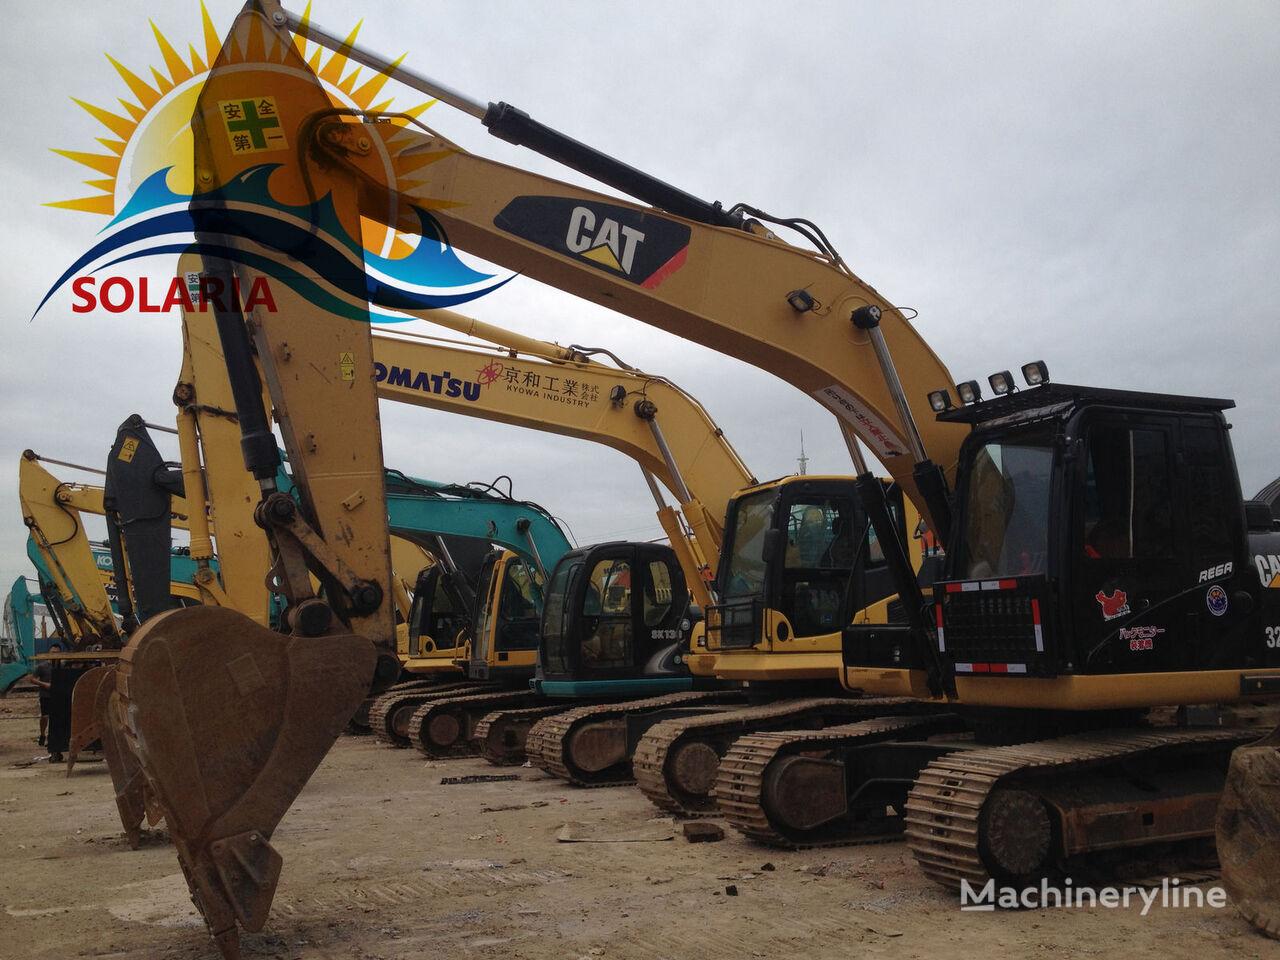 CATERPILLAR 320D excavadora de orugas